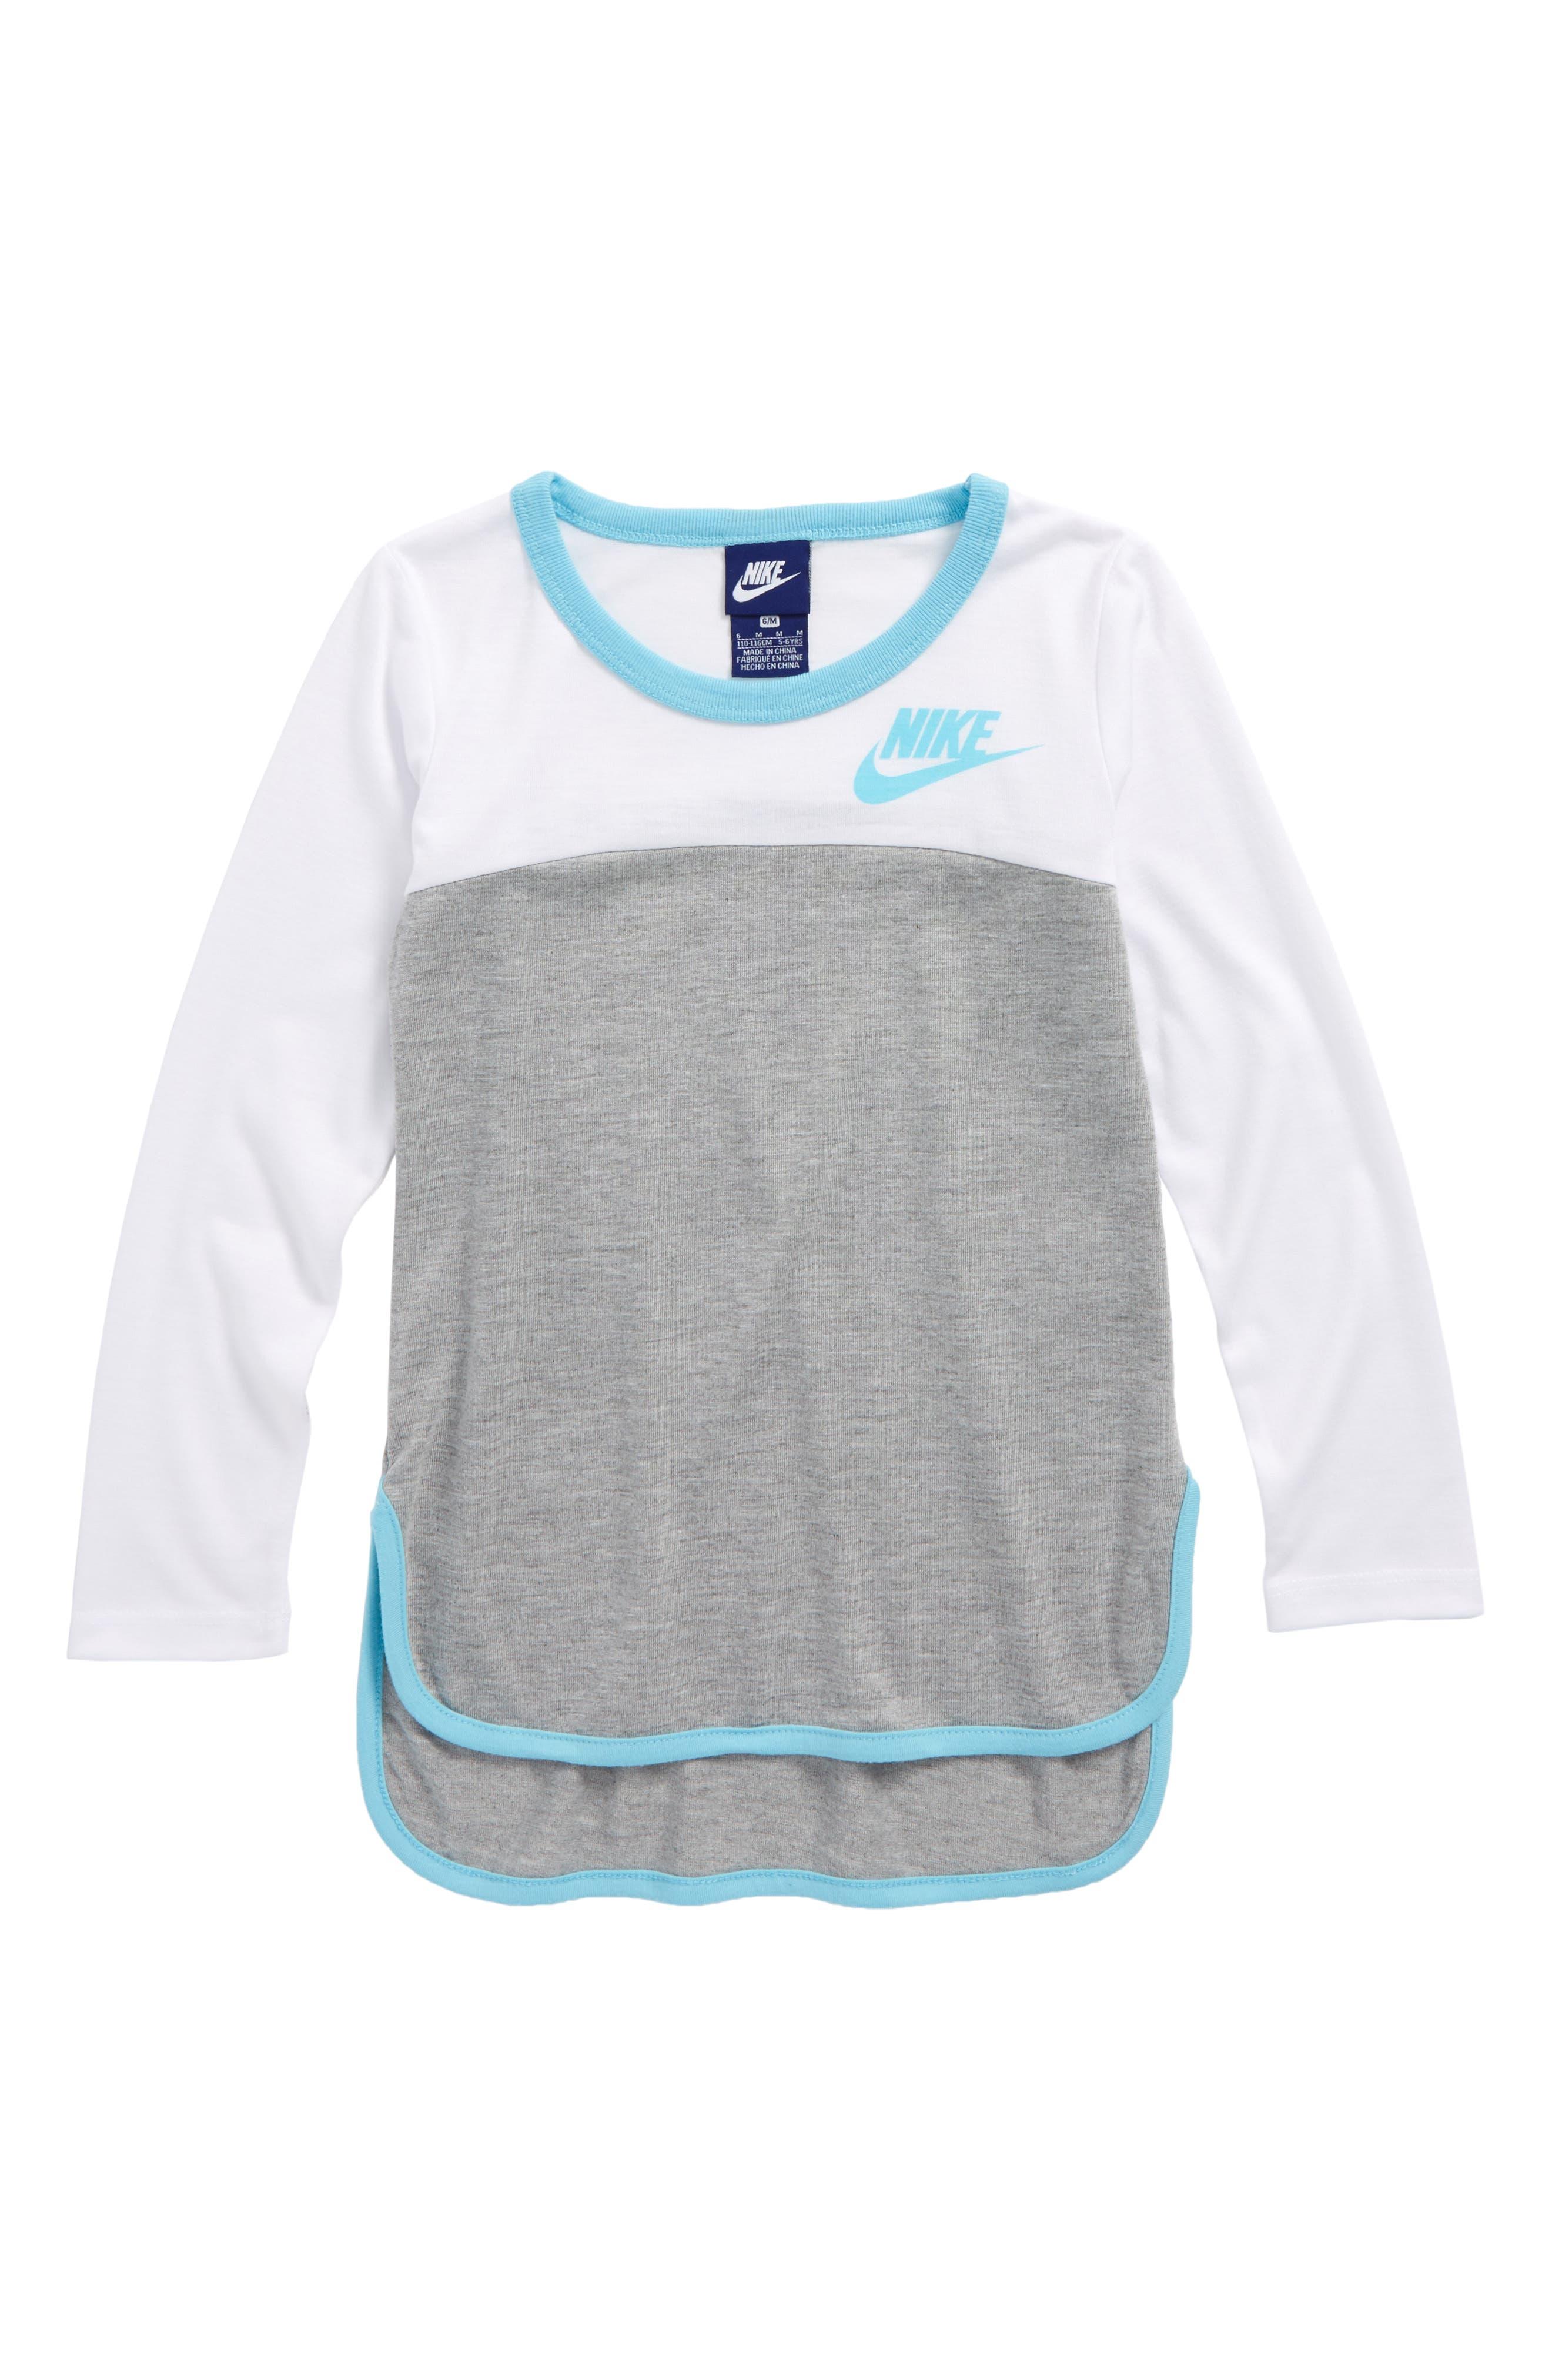 Main Image - Nike Color Block Long Sleeve Tee (Toddler Girls & Little Girls)